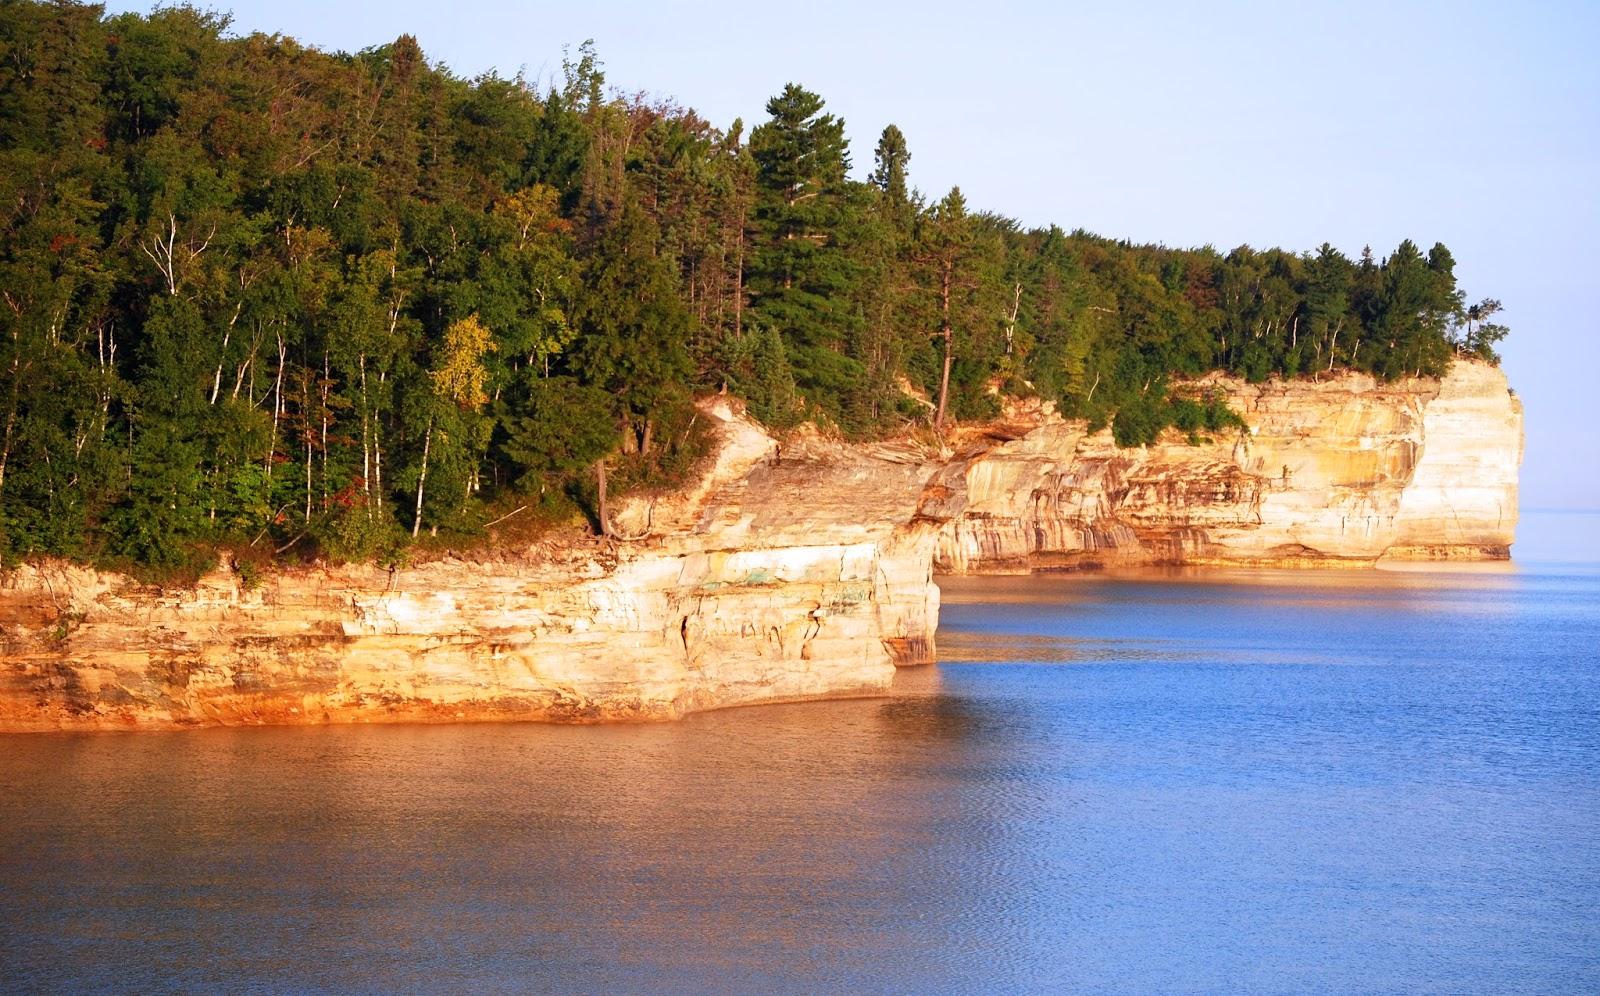 I Heart Michigan Pictured Rocks National Lakeshore